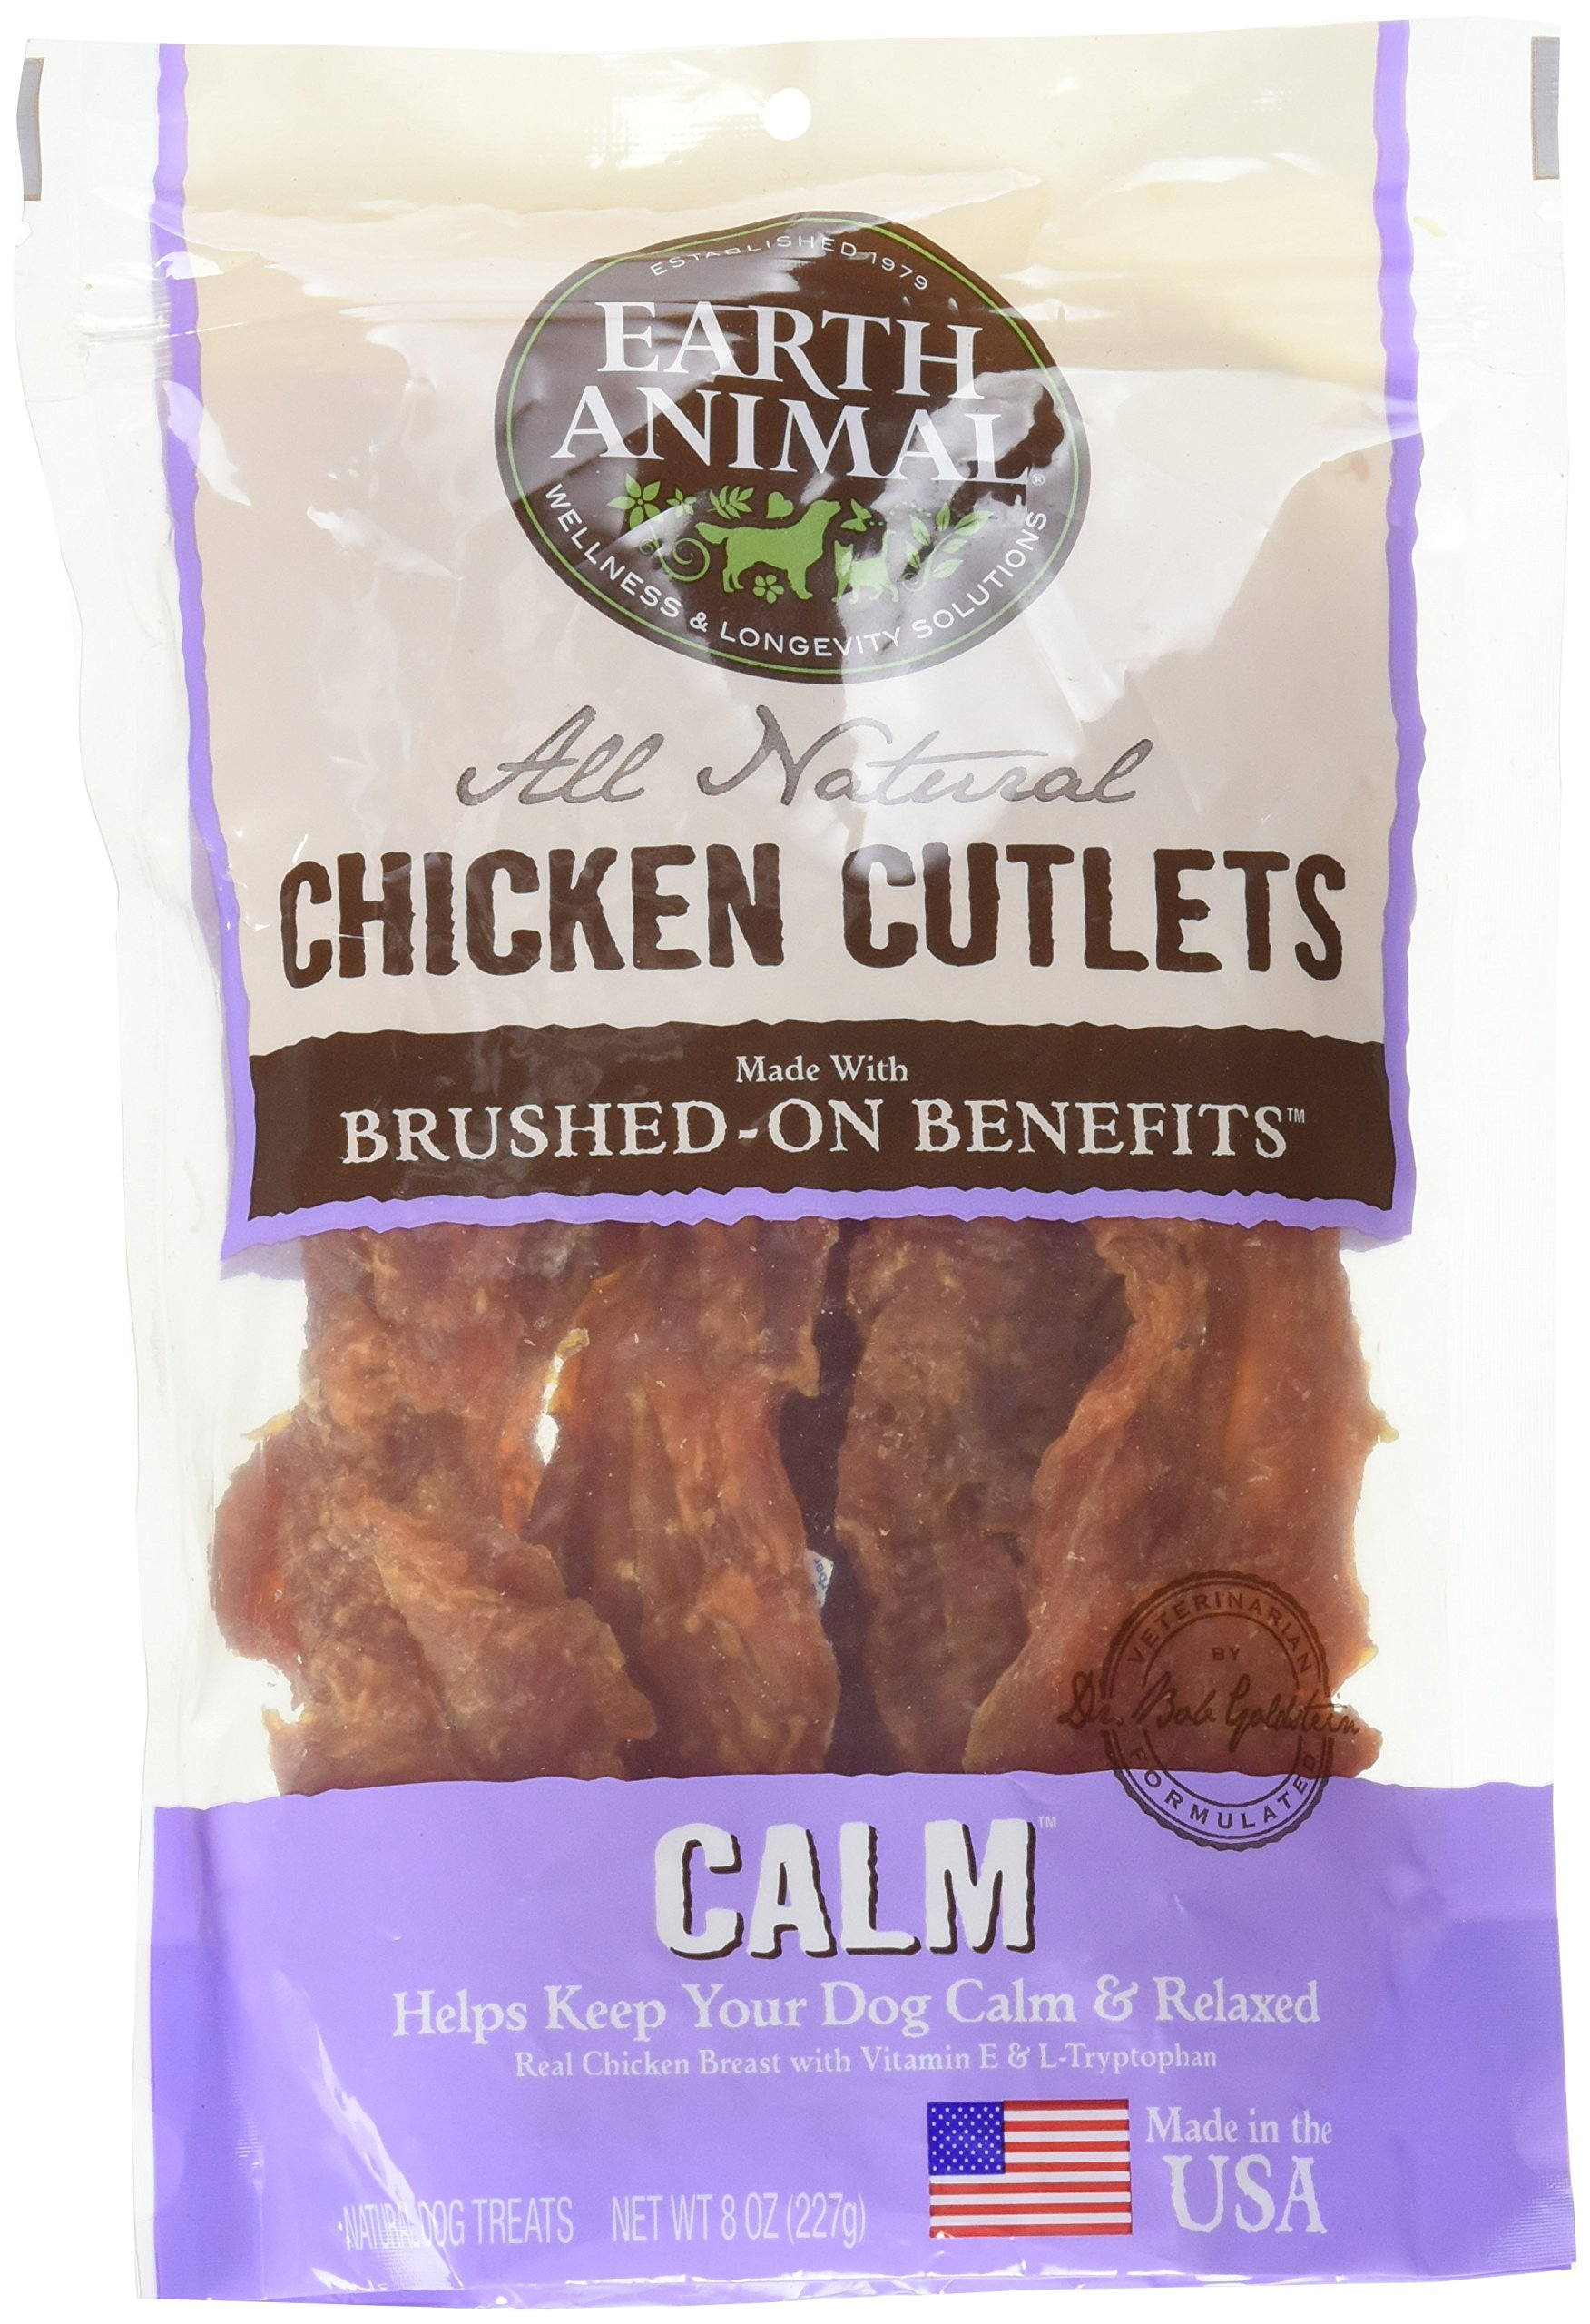 Earth Animal Calm USA Chicken Jerky Dog Treats, 8 Ounces by Earth Animal (Image #1)